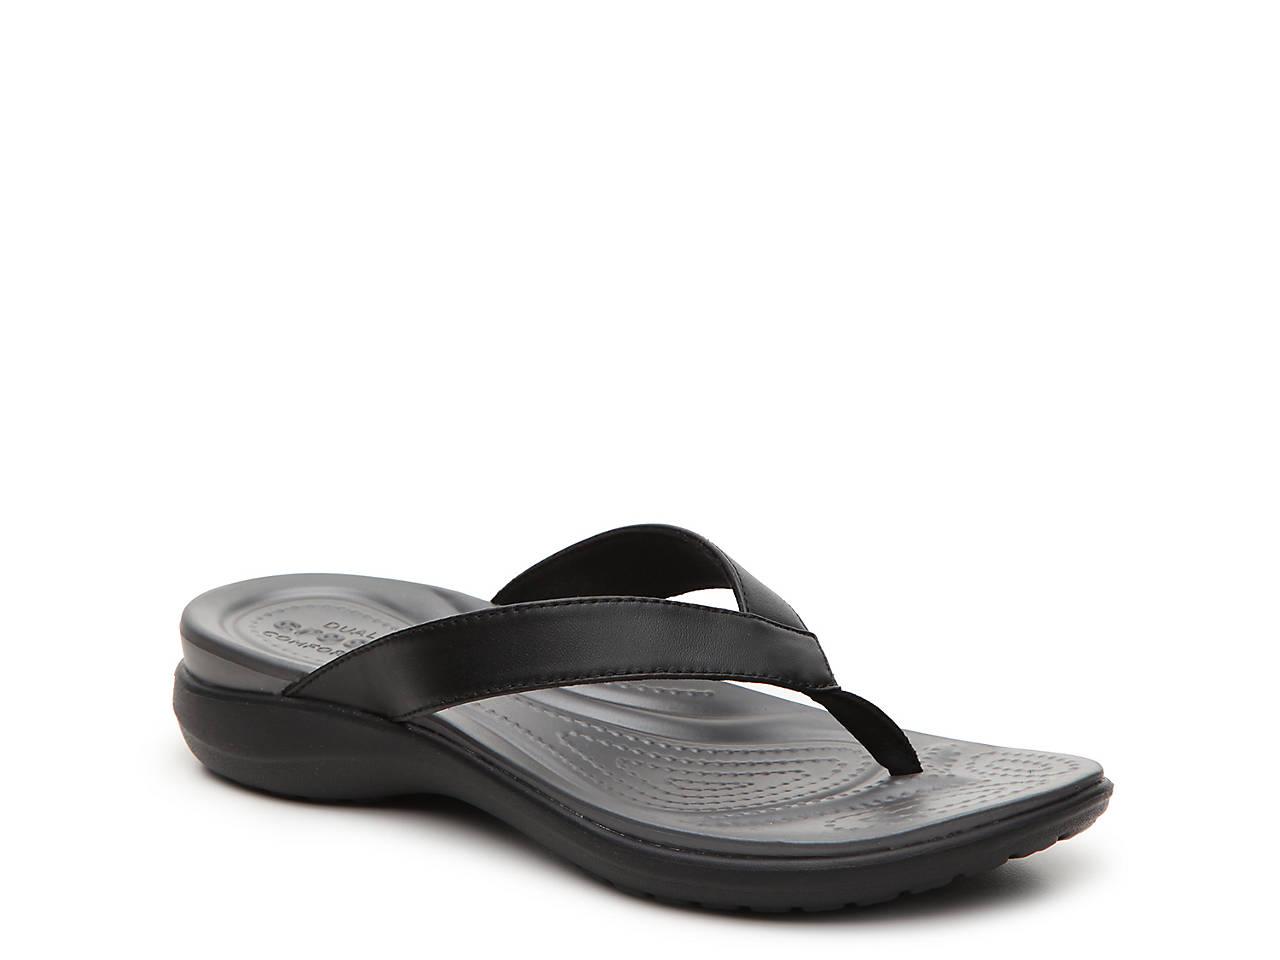 dd15e721b492 Crocs Capri Sandal Women s Shoes